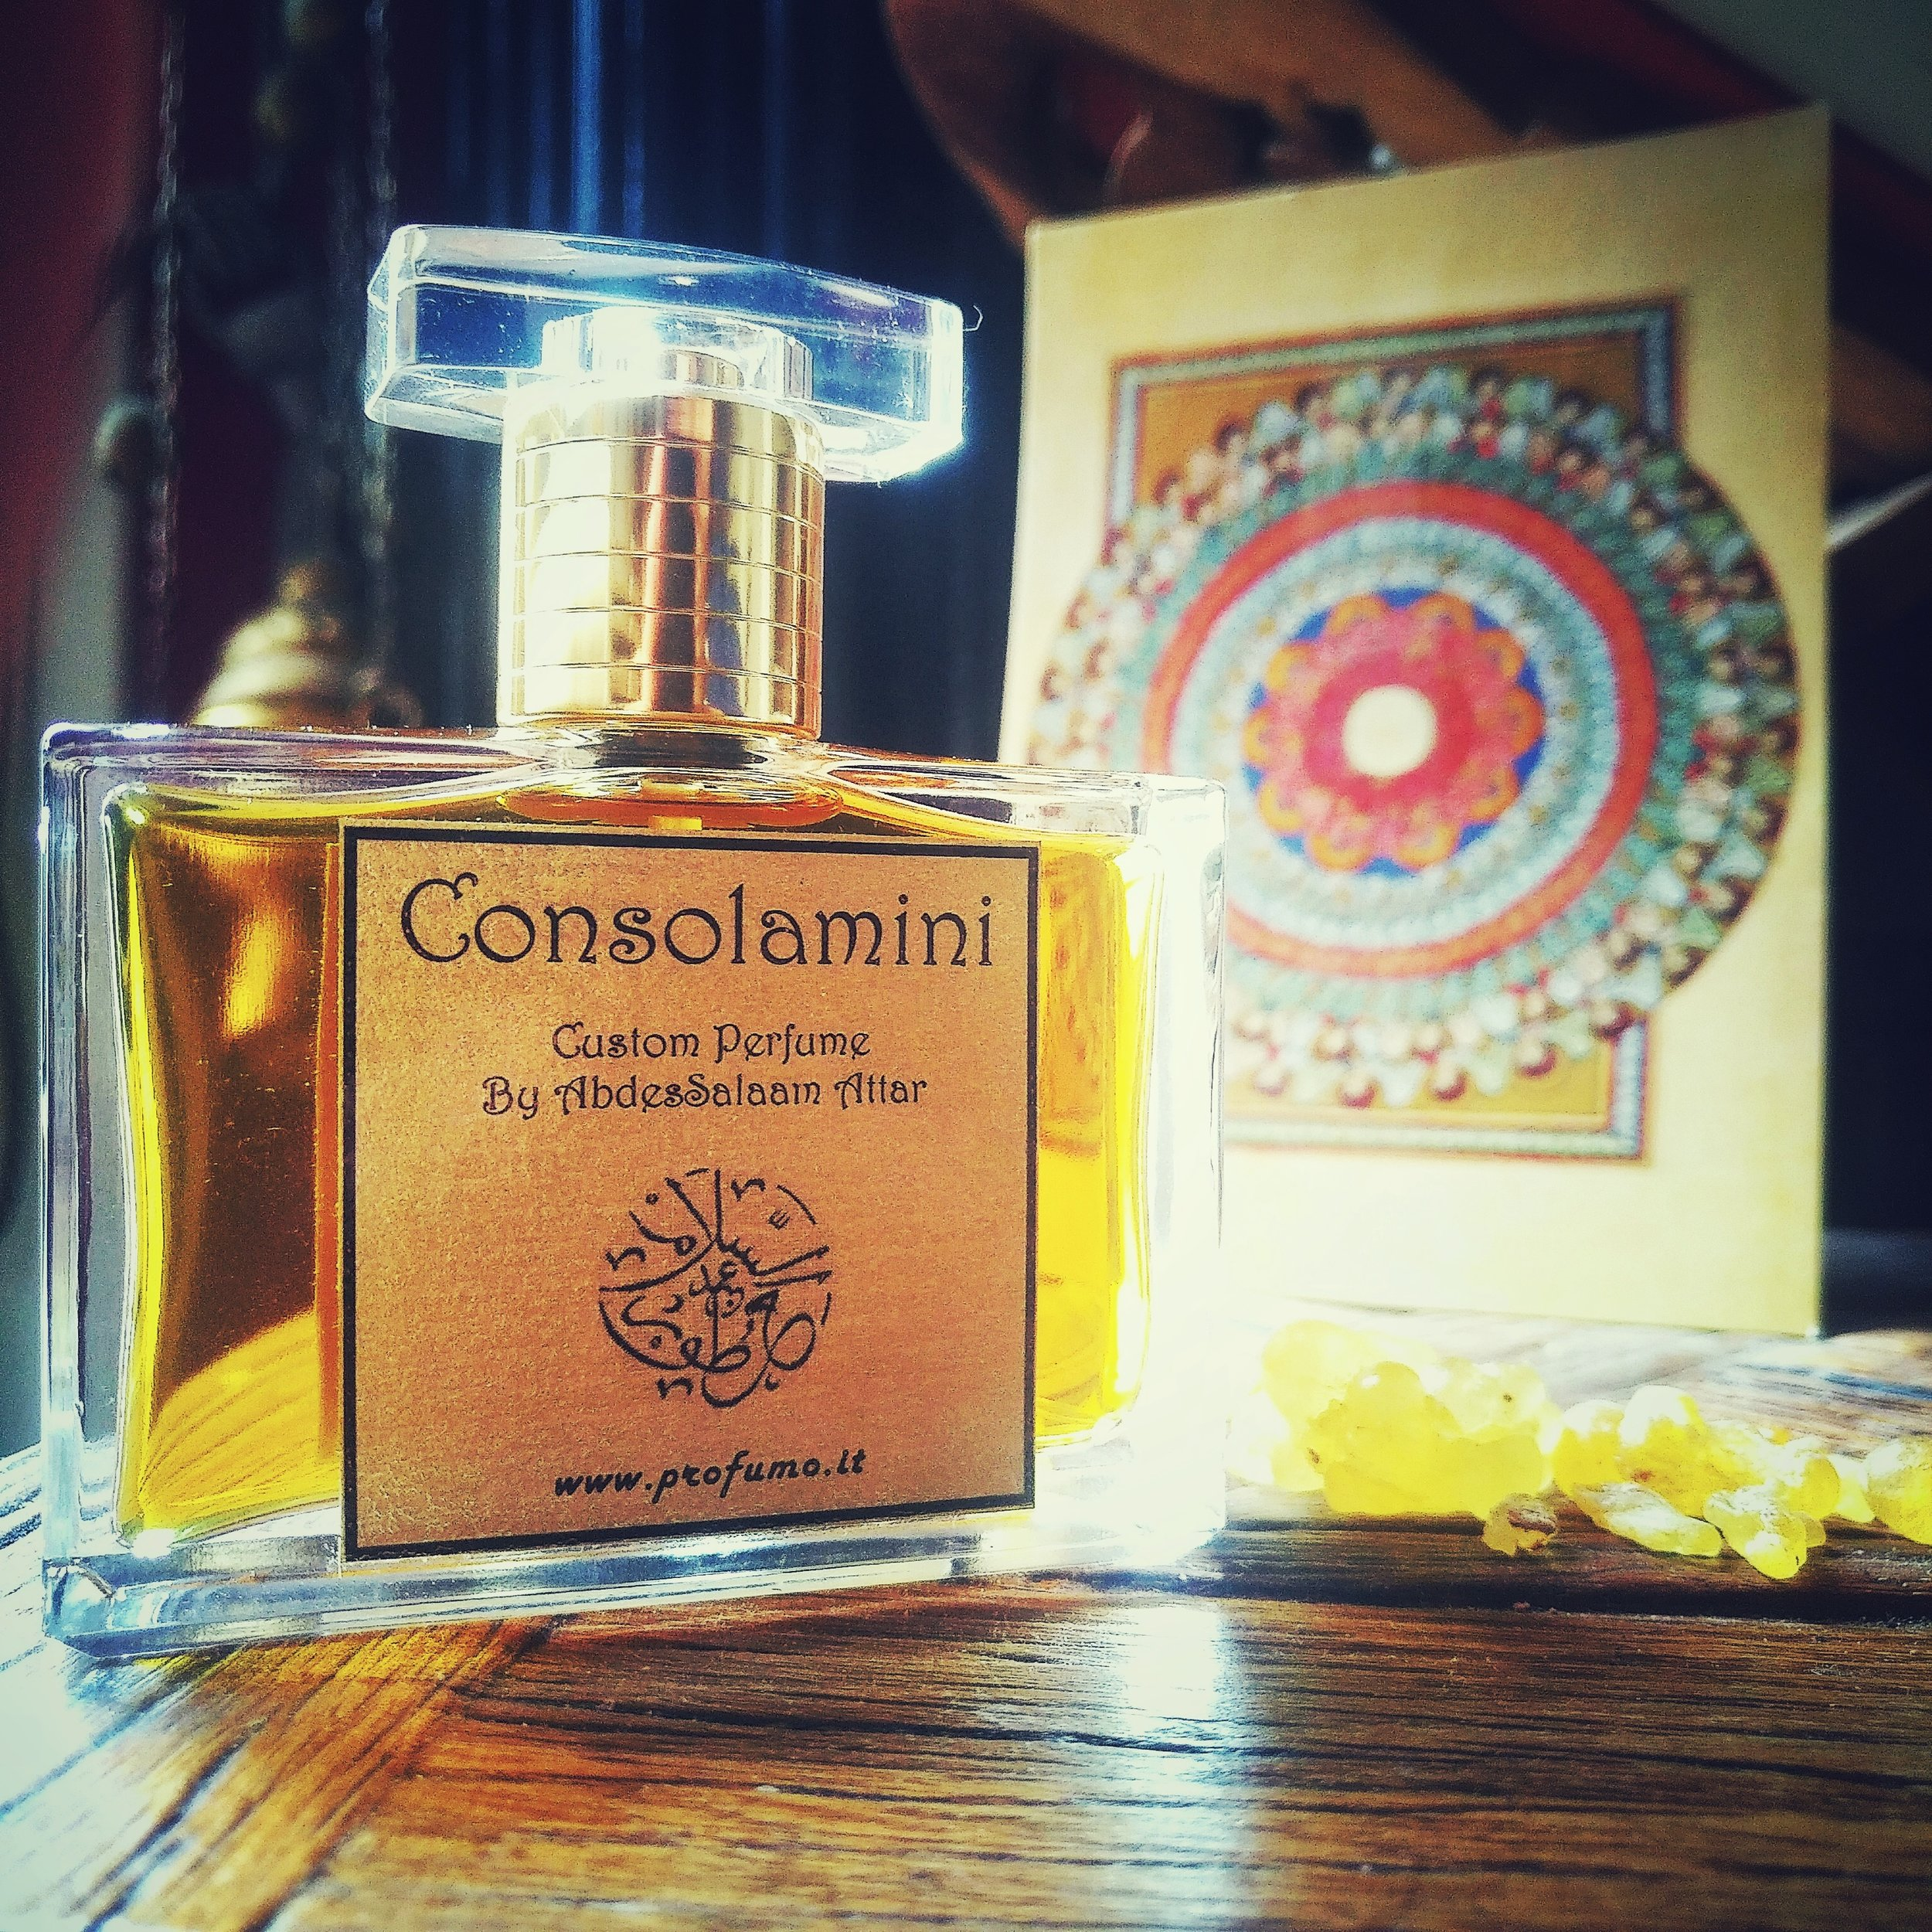 Consolamini - AbdesSalaam Attar